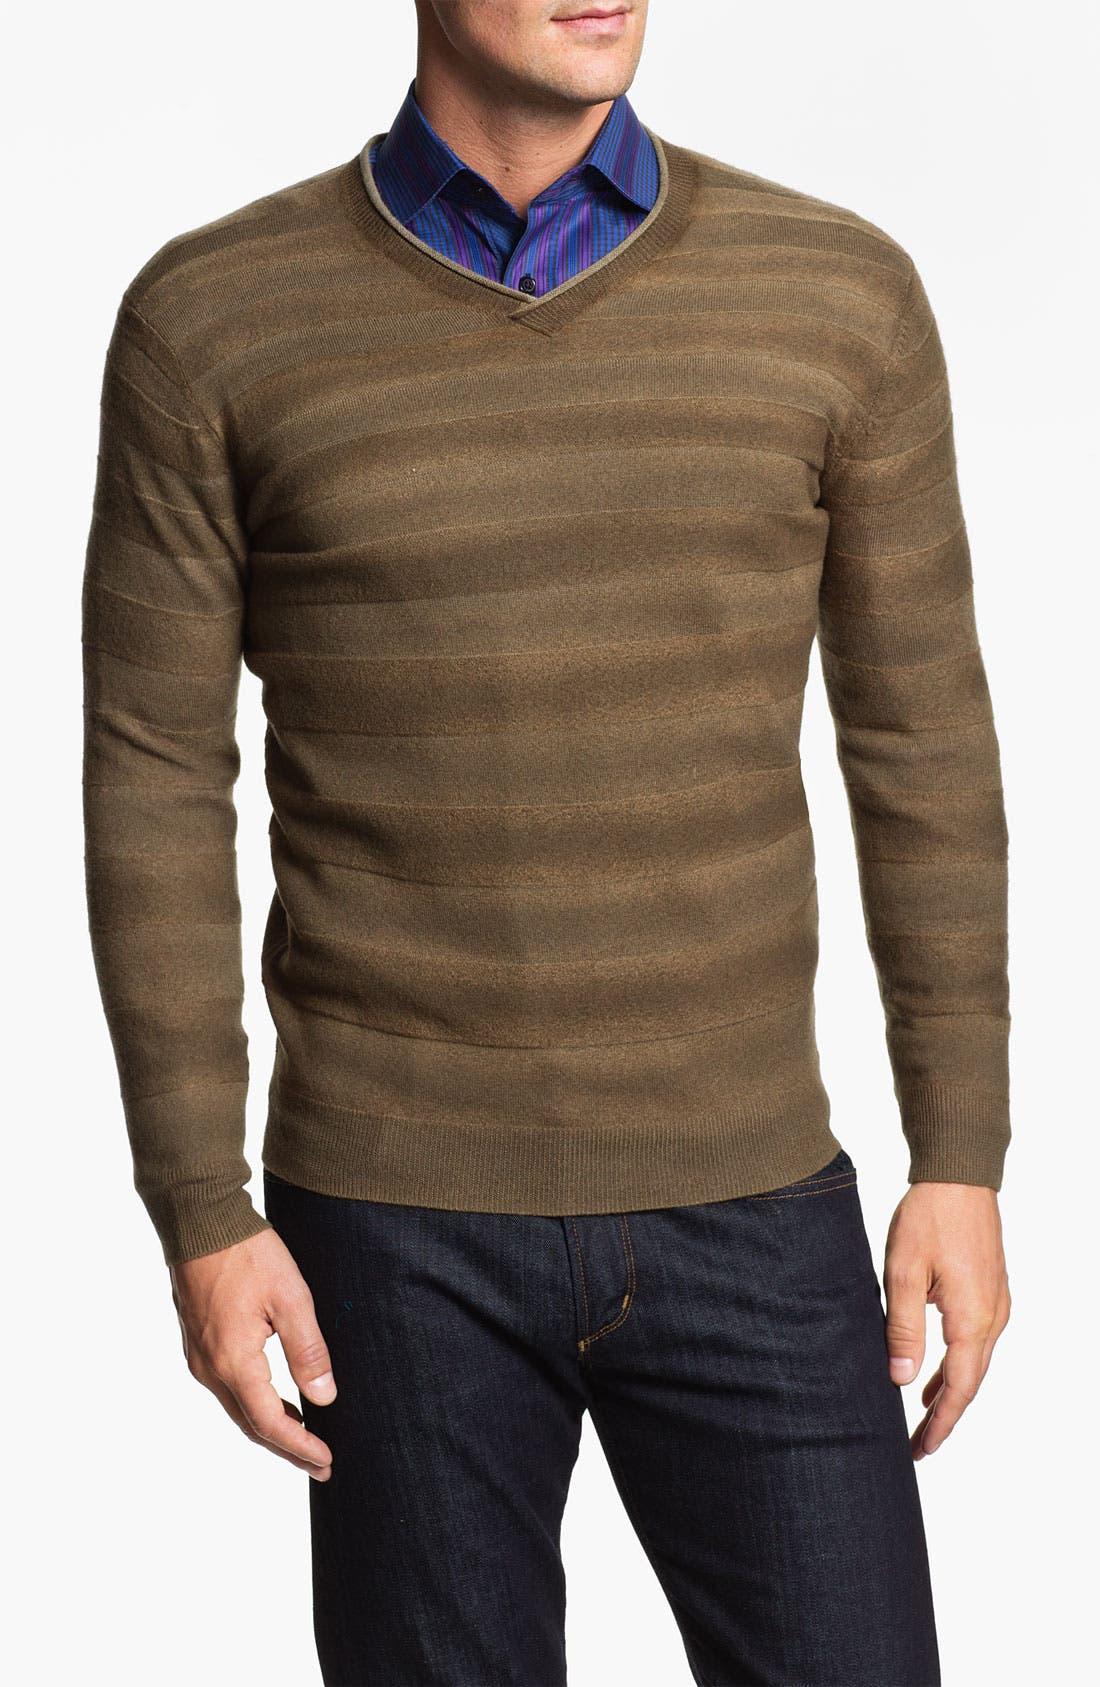 Main Image - Bugatchi Uomo V-Neck Merino Wool Sweater